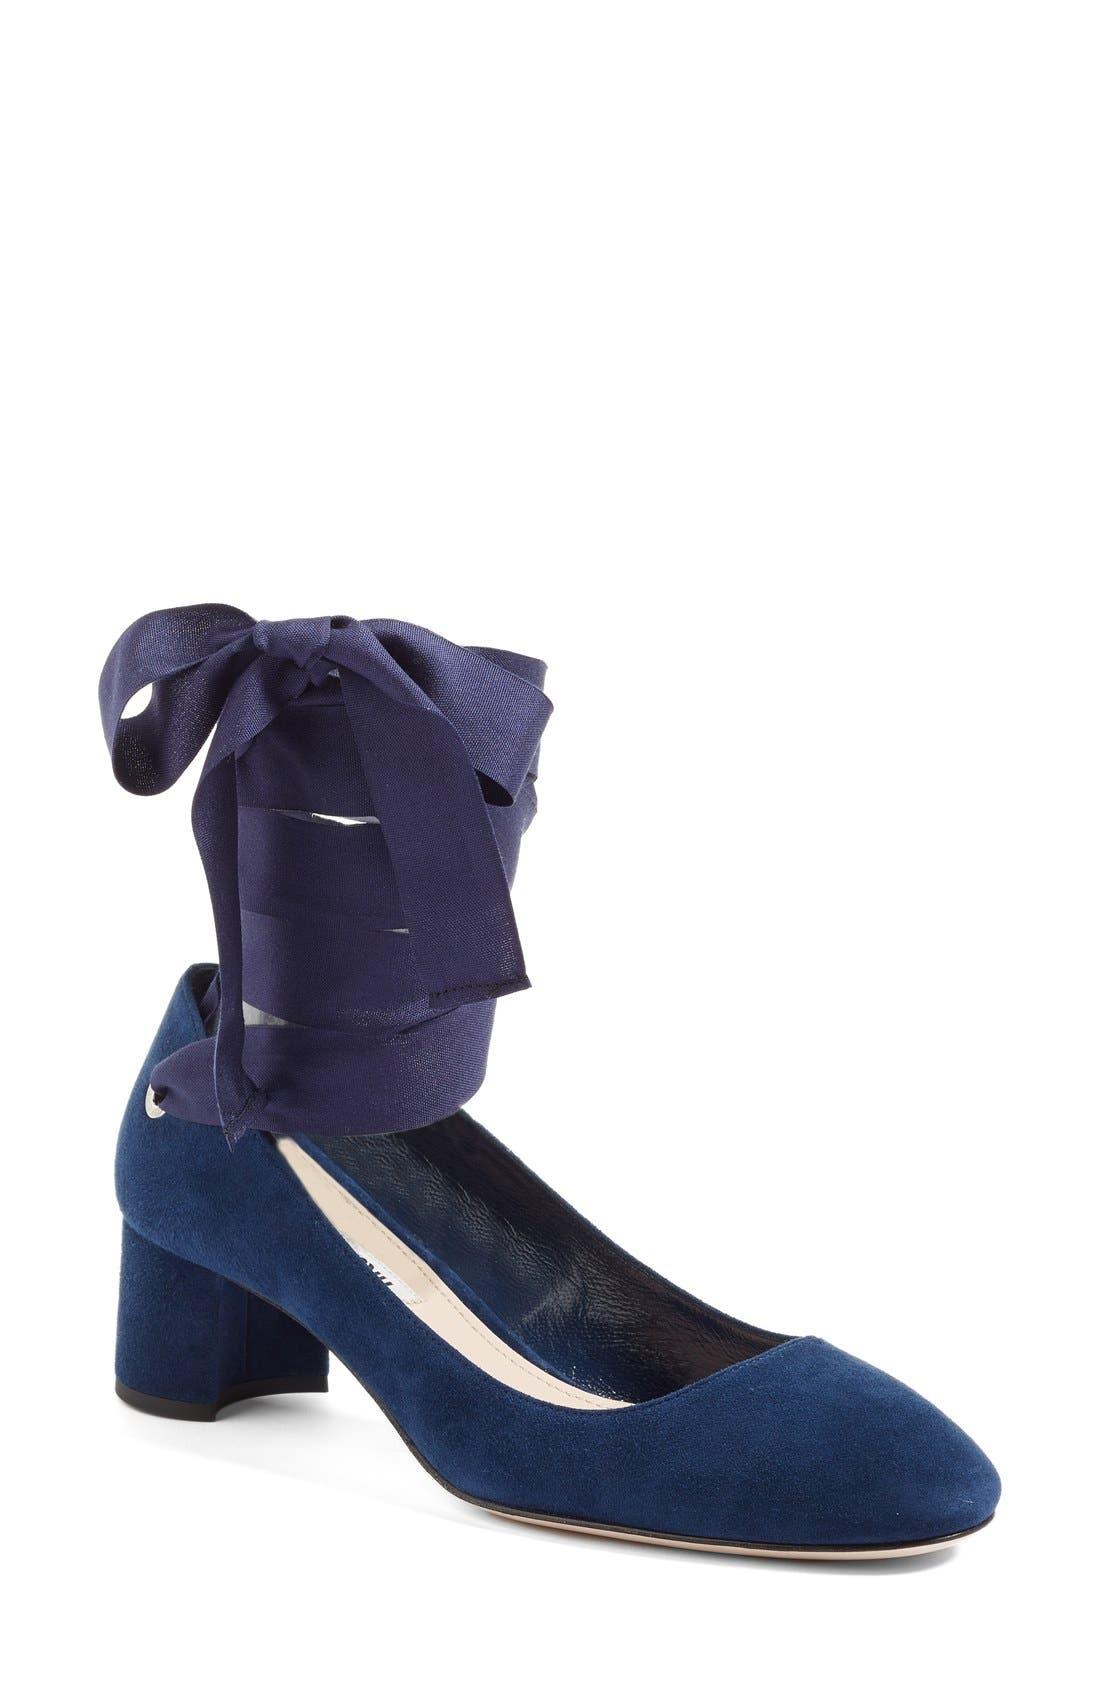 Main Image - Miu Miu Ribbon Lace Wraparound Pump (Women)